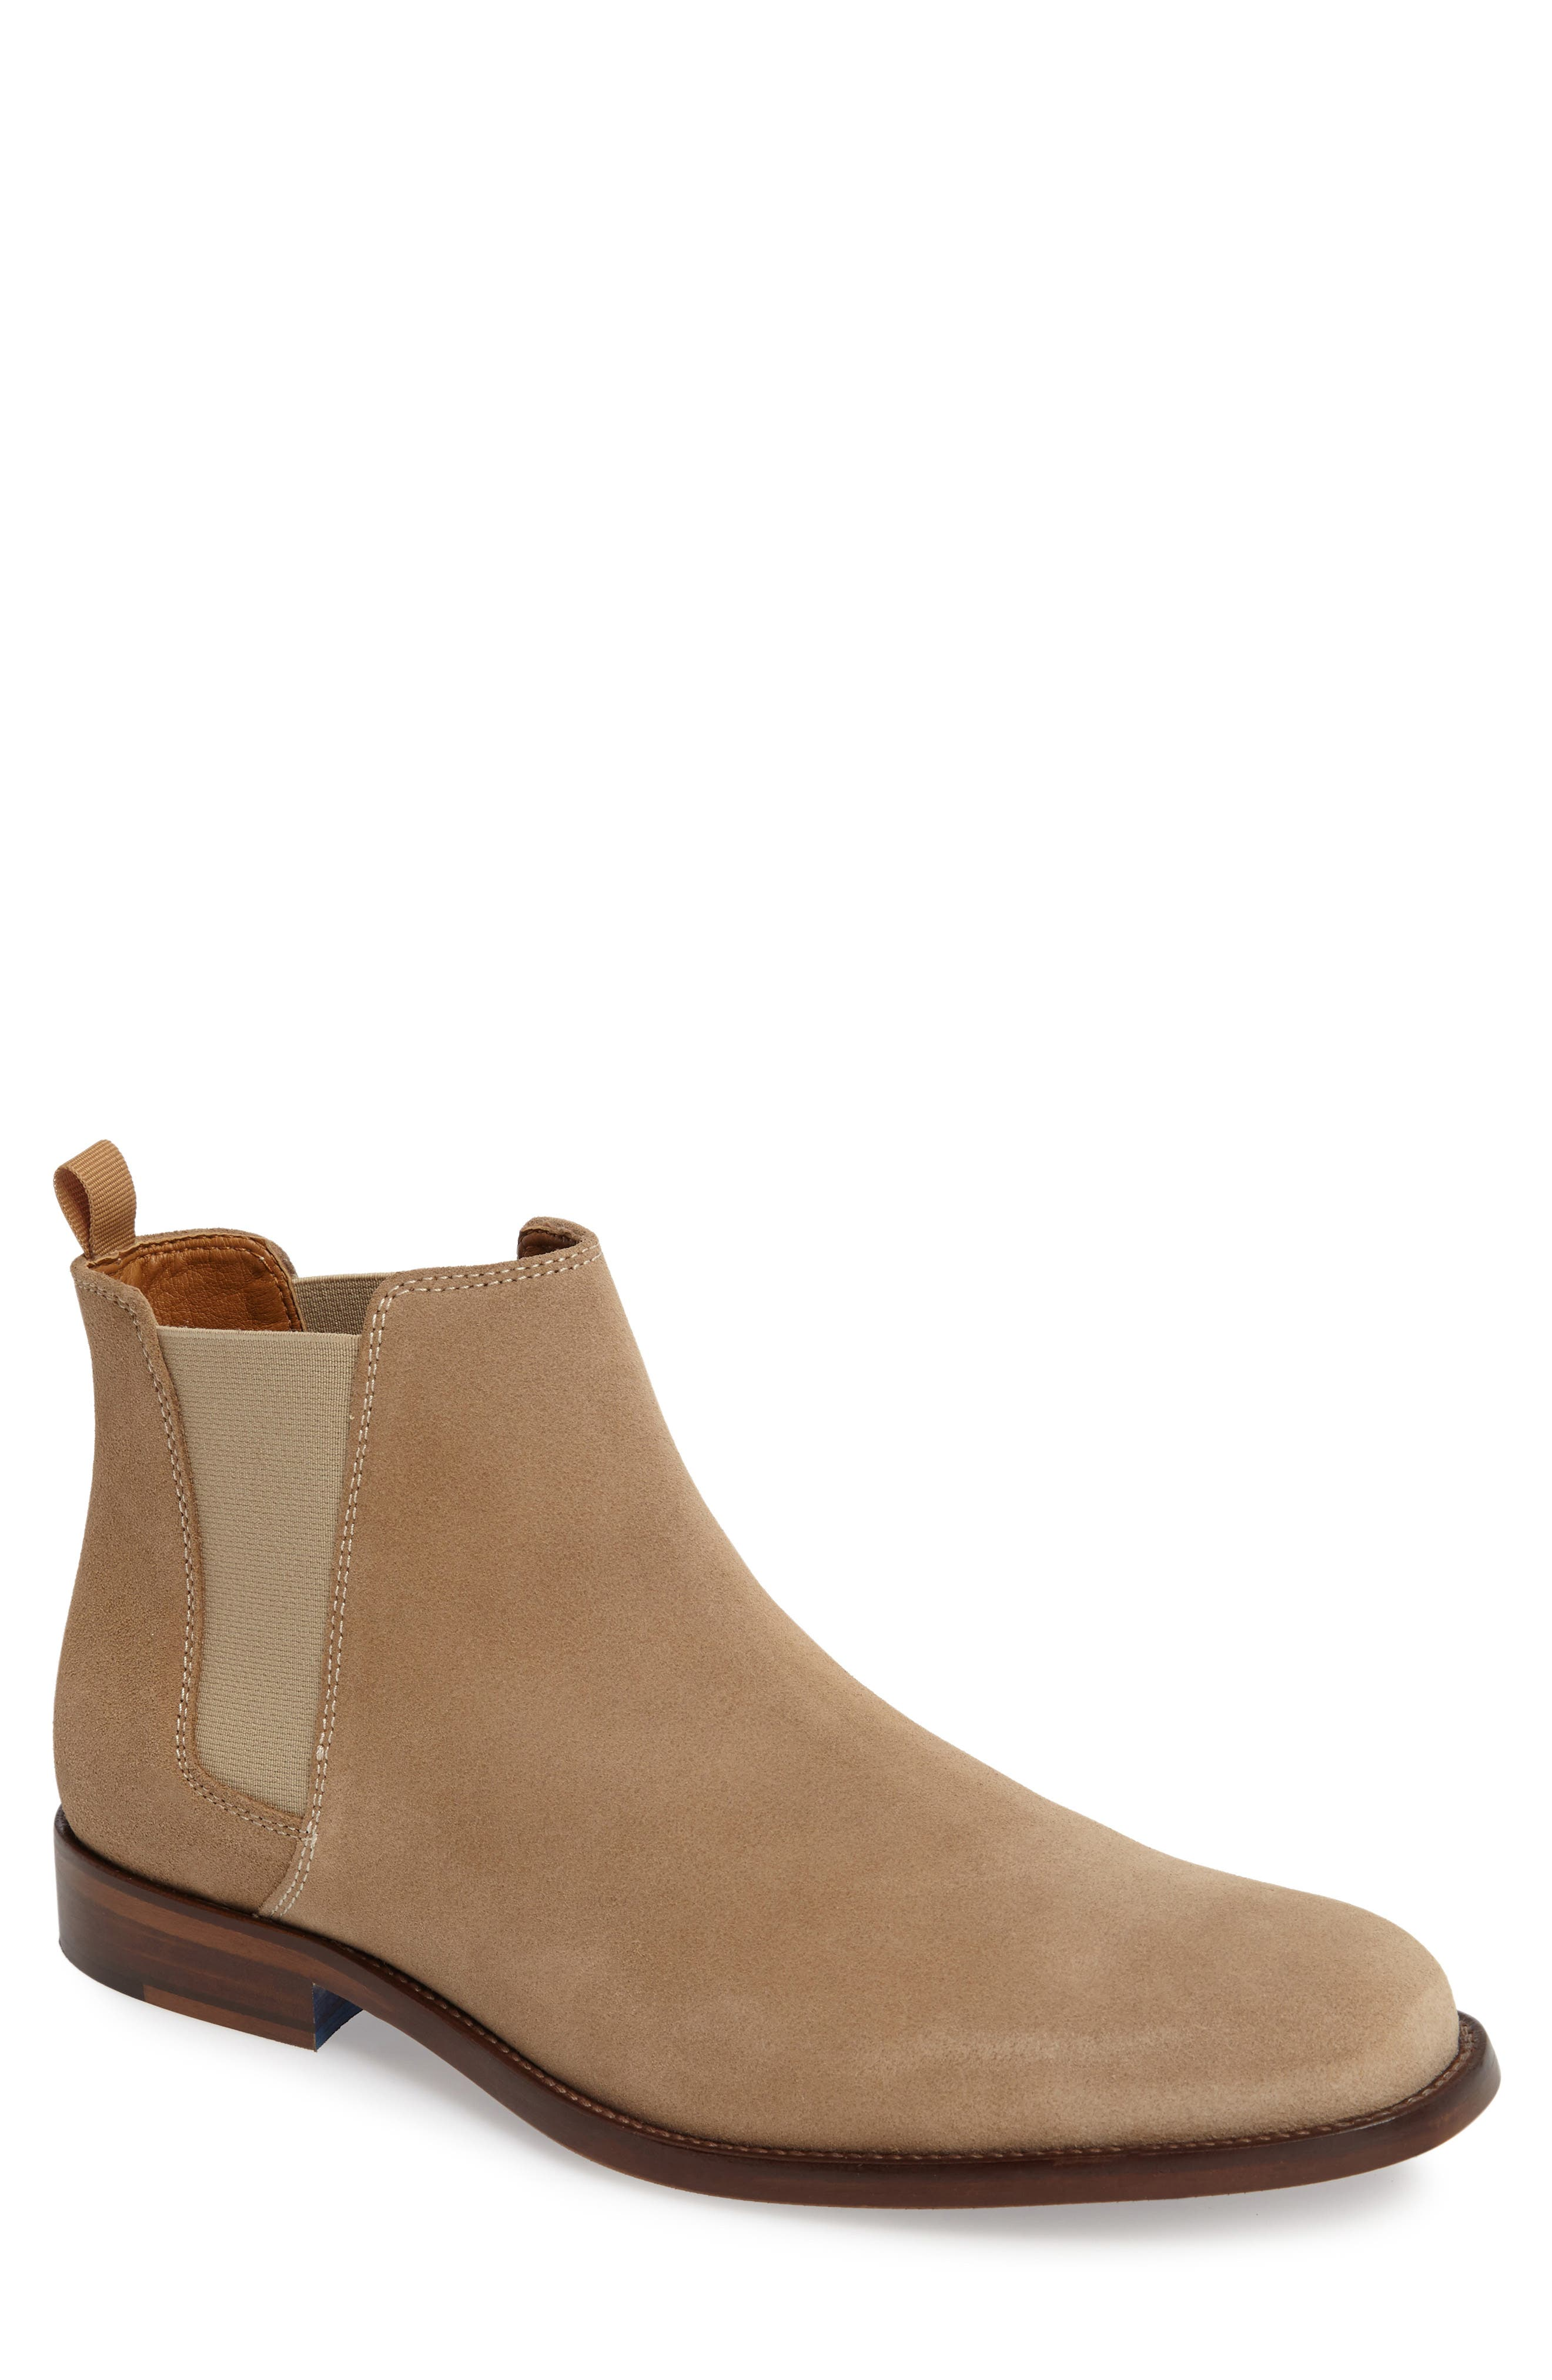 Alternate Image 1 Selected - ALDO Vianello Chelsea Boot (Men)